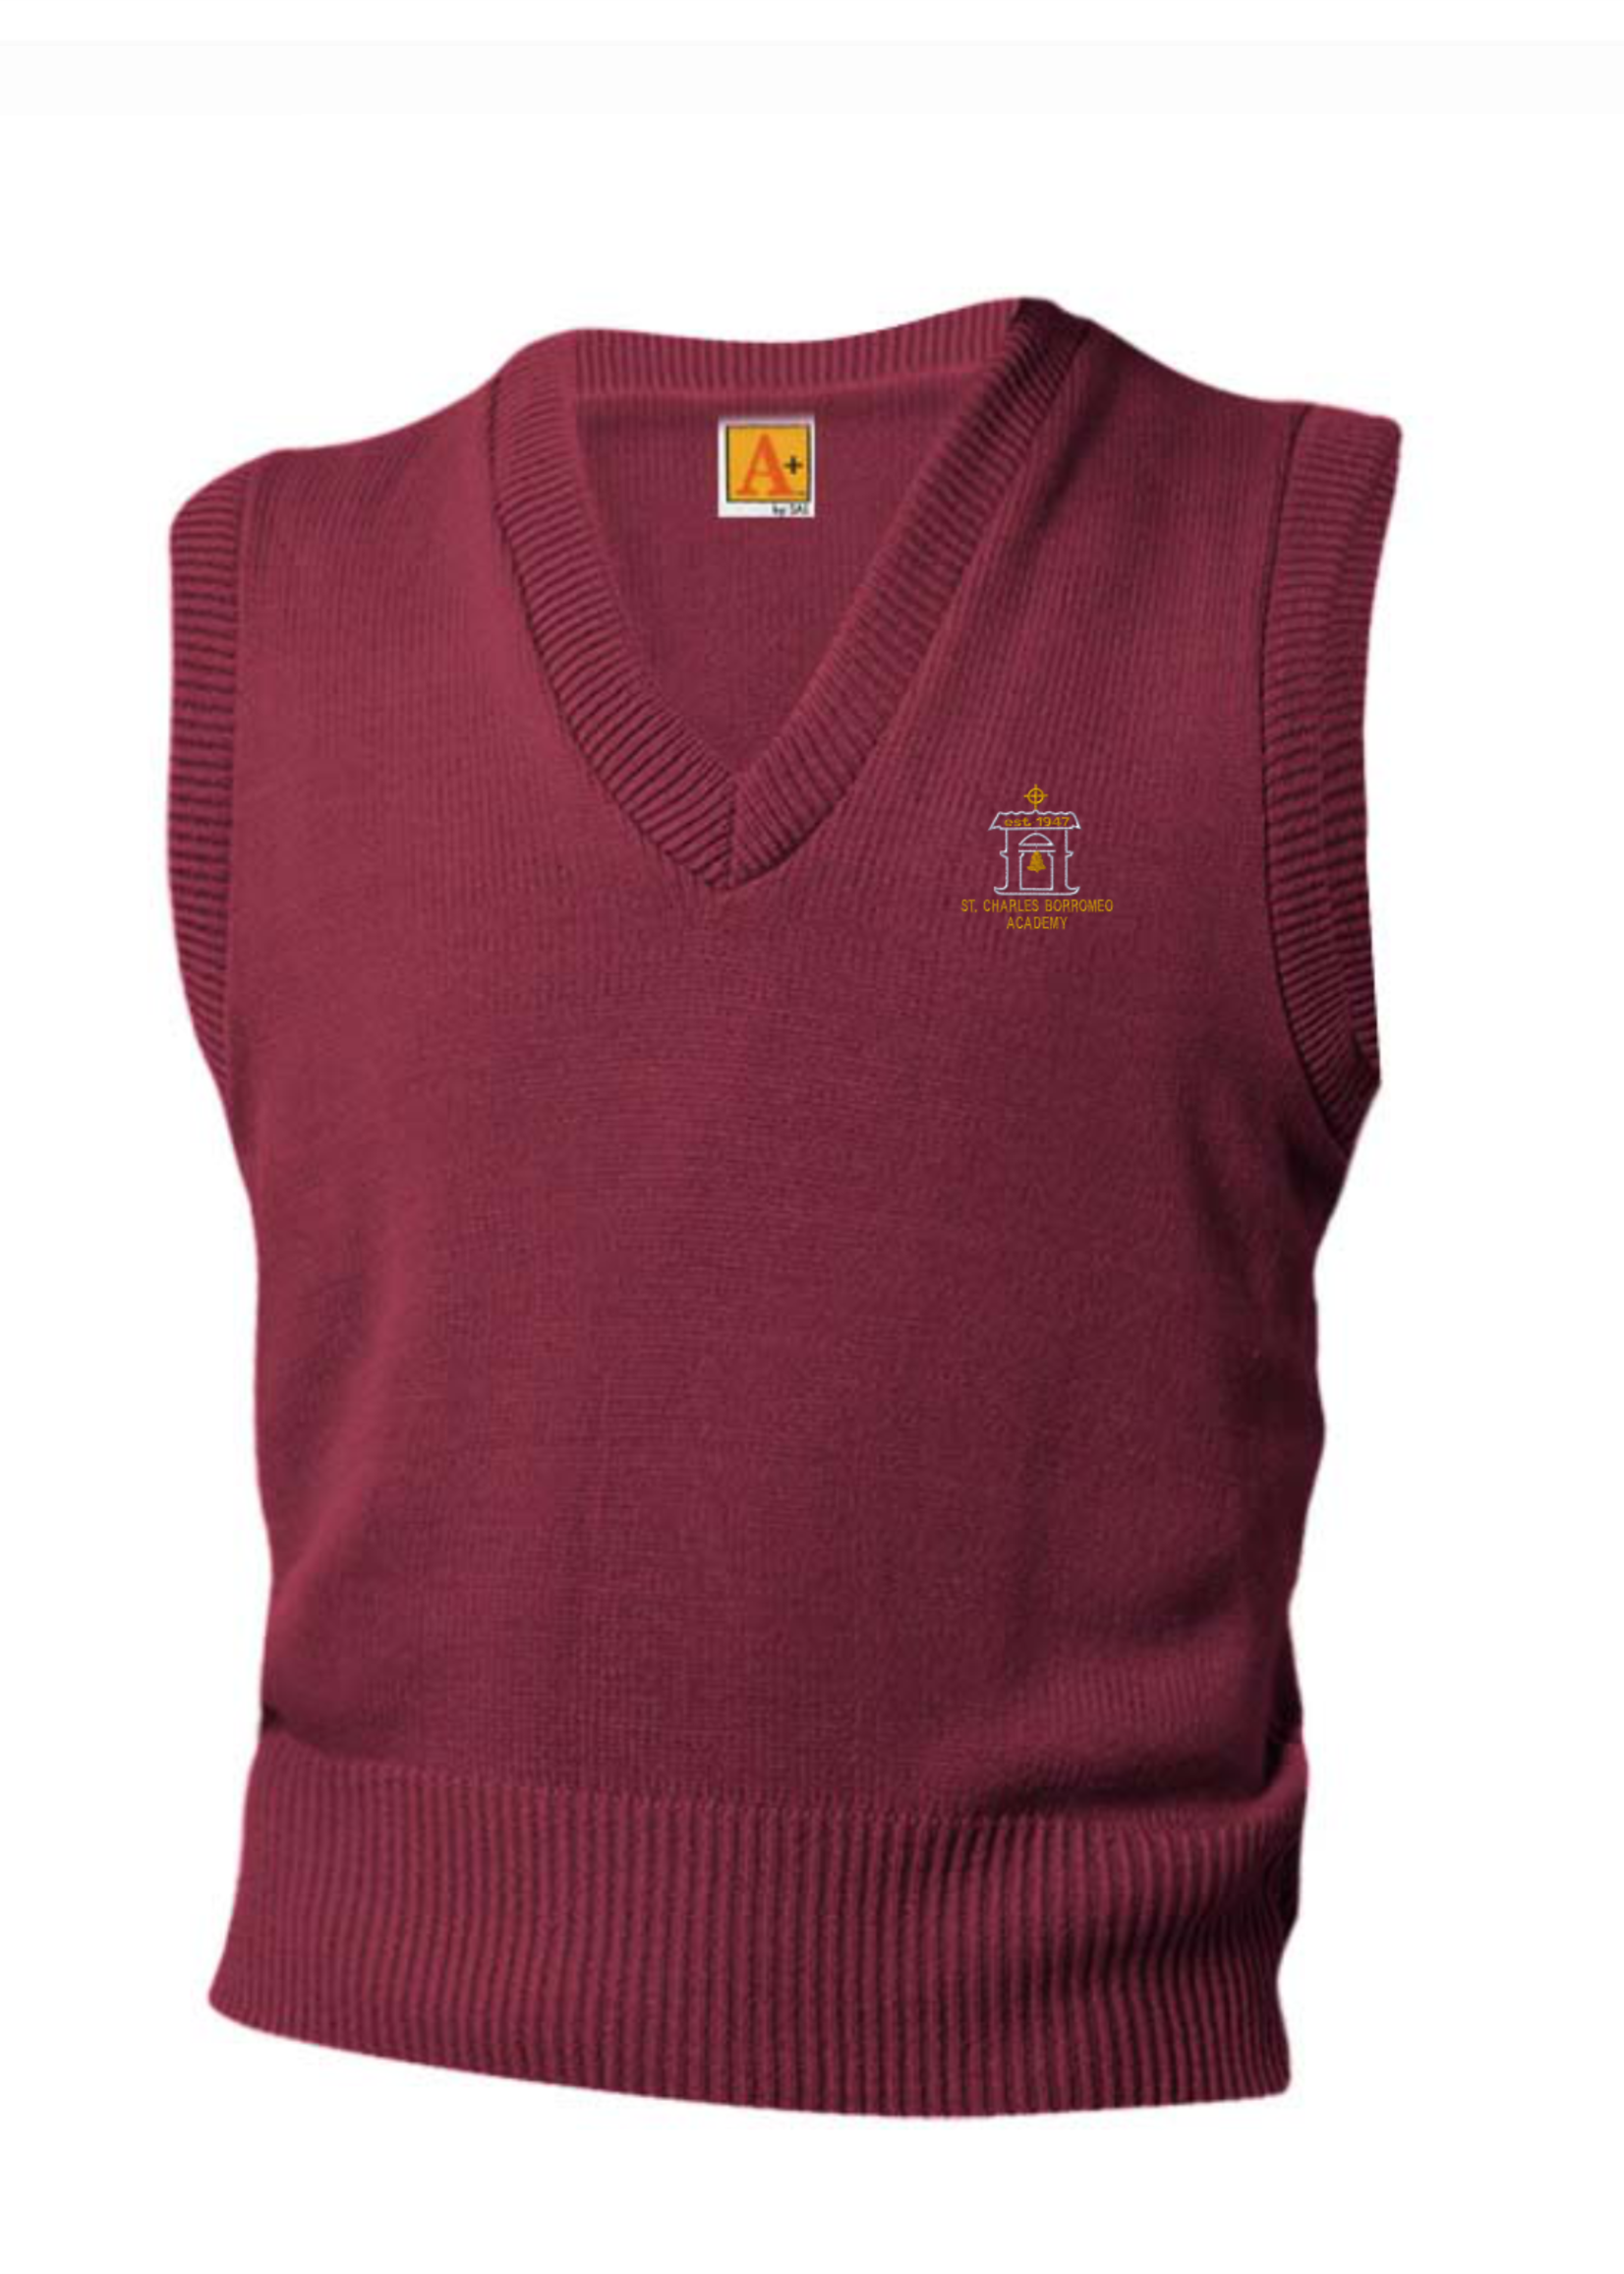 SCBA Wine V-neck sweater vest